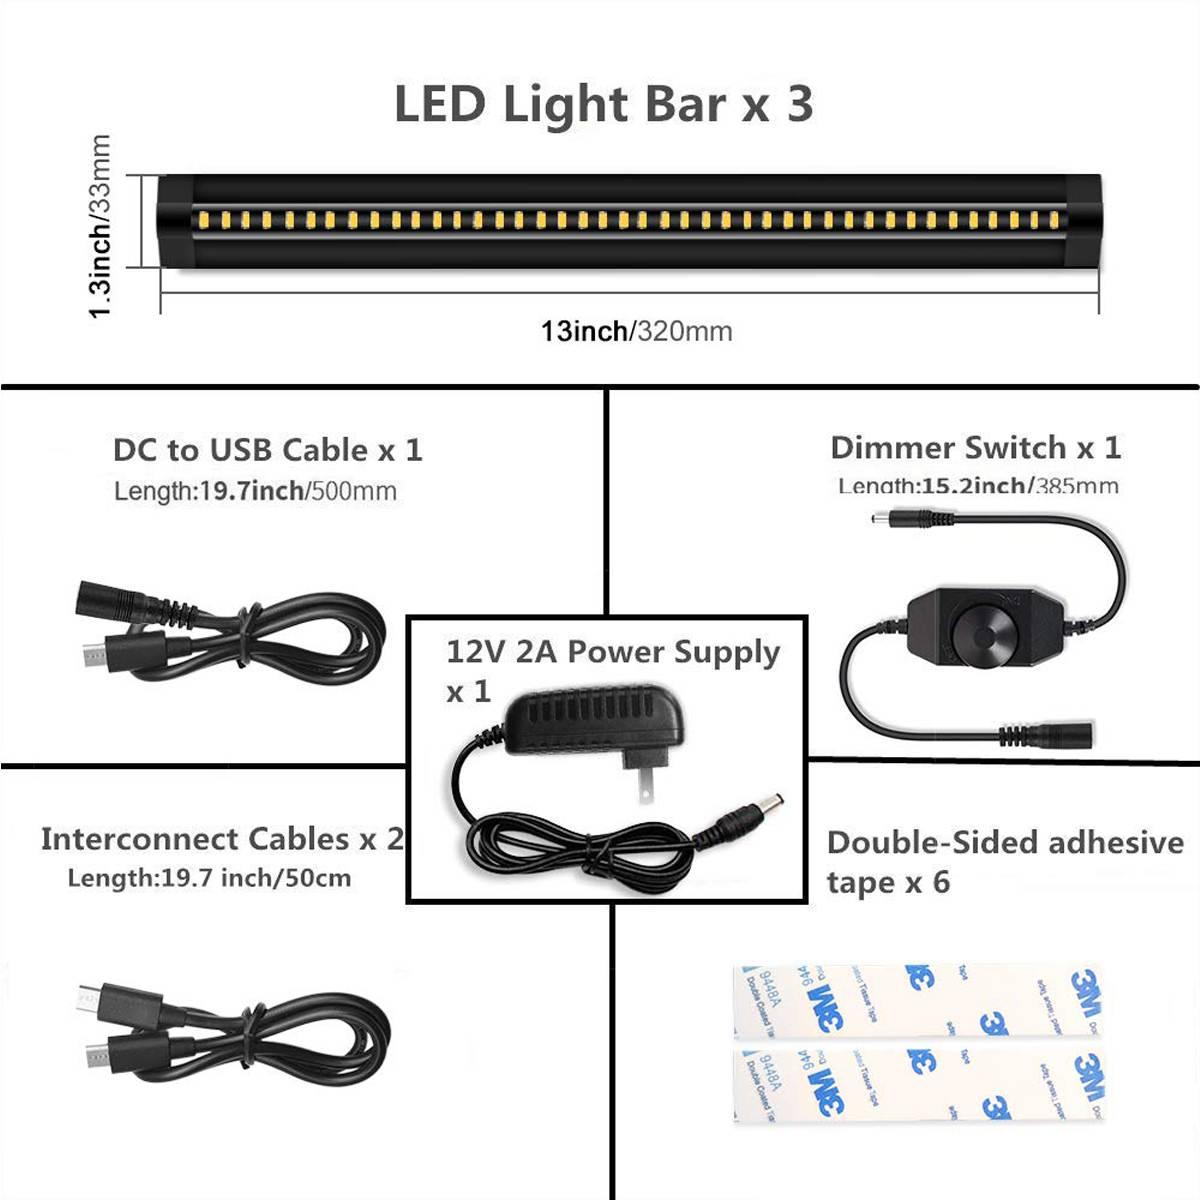 30CM LED Under Cabinet Strip Light Bar Lamp CRI90 Warm Dimmable Waterproof Table Lamp desk light For Reading Study Office Light 12